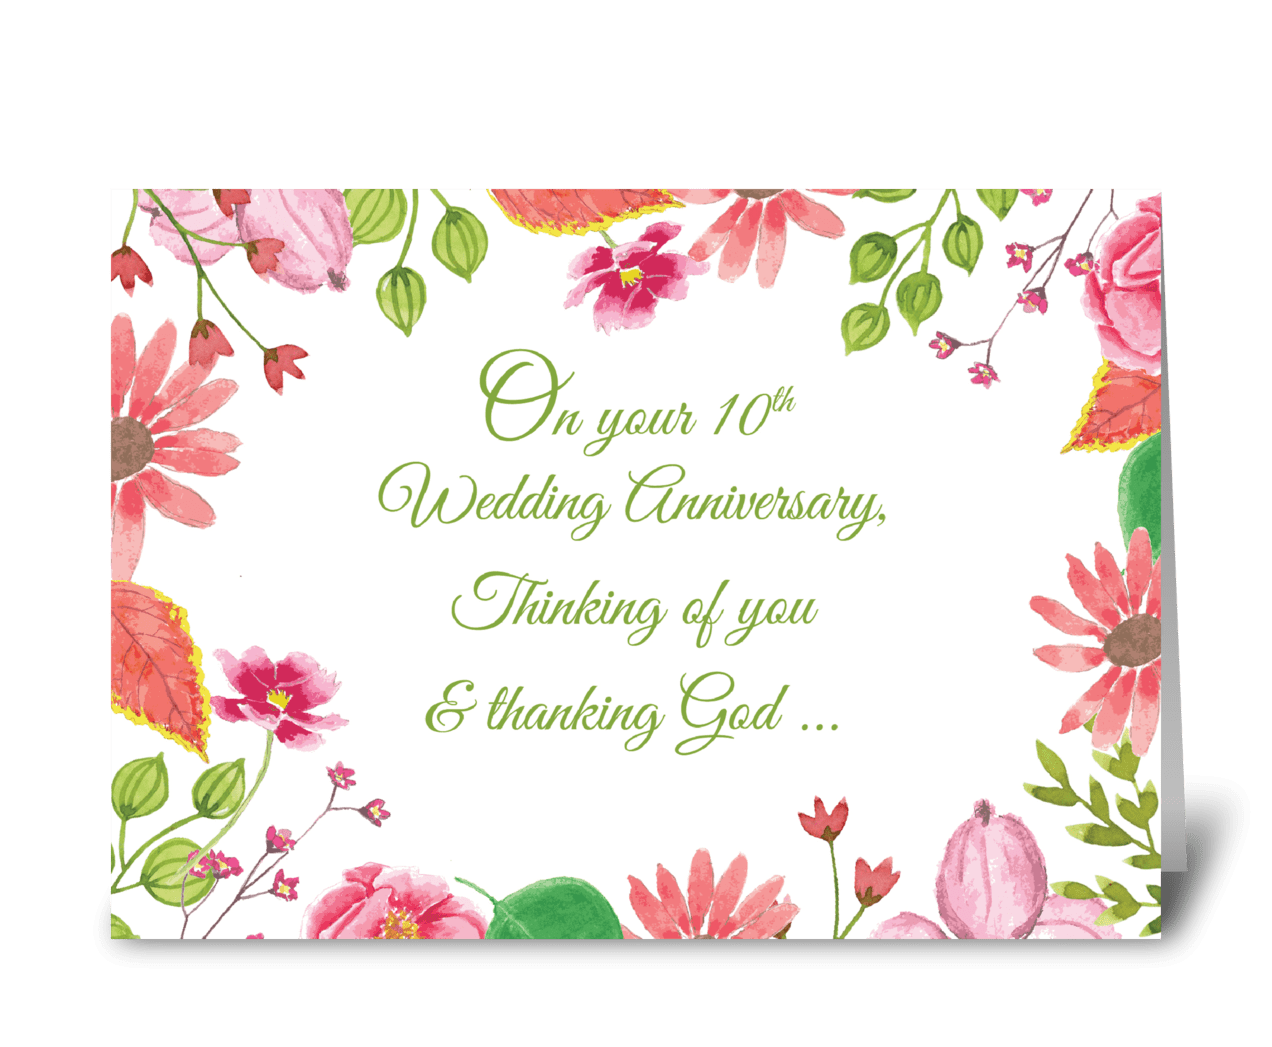 religious 10th wedding anniversary  send this greeting